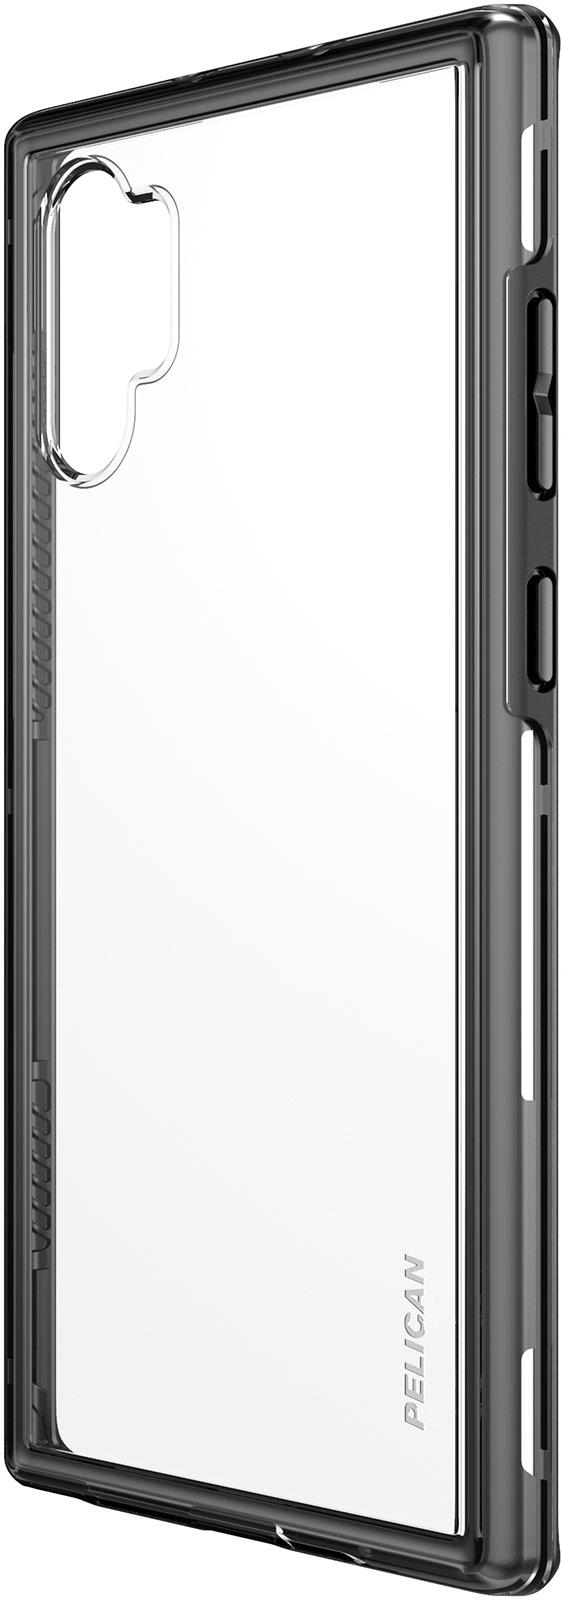 pelican samsung galaxy note10 plus black clear case